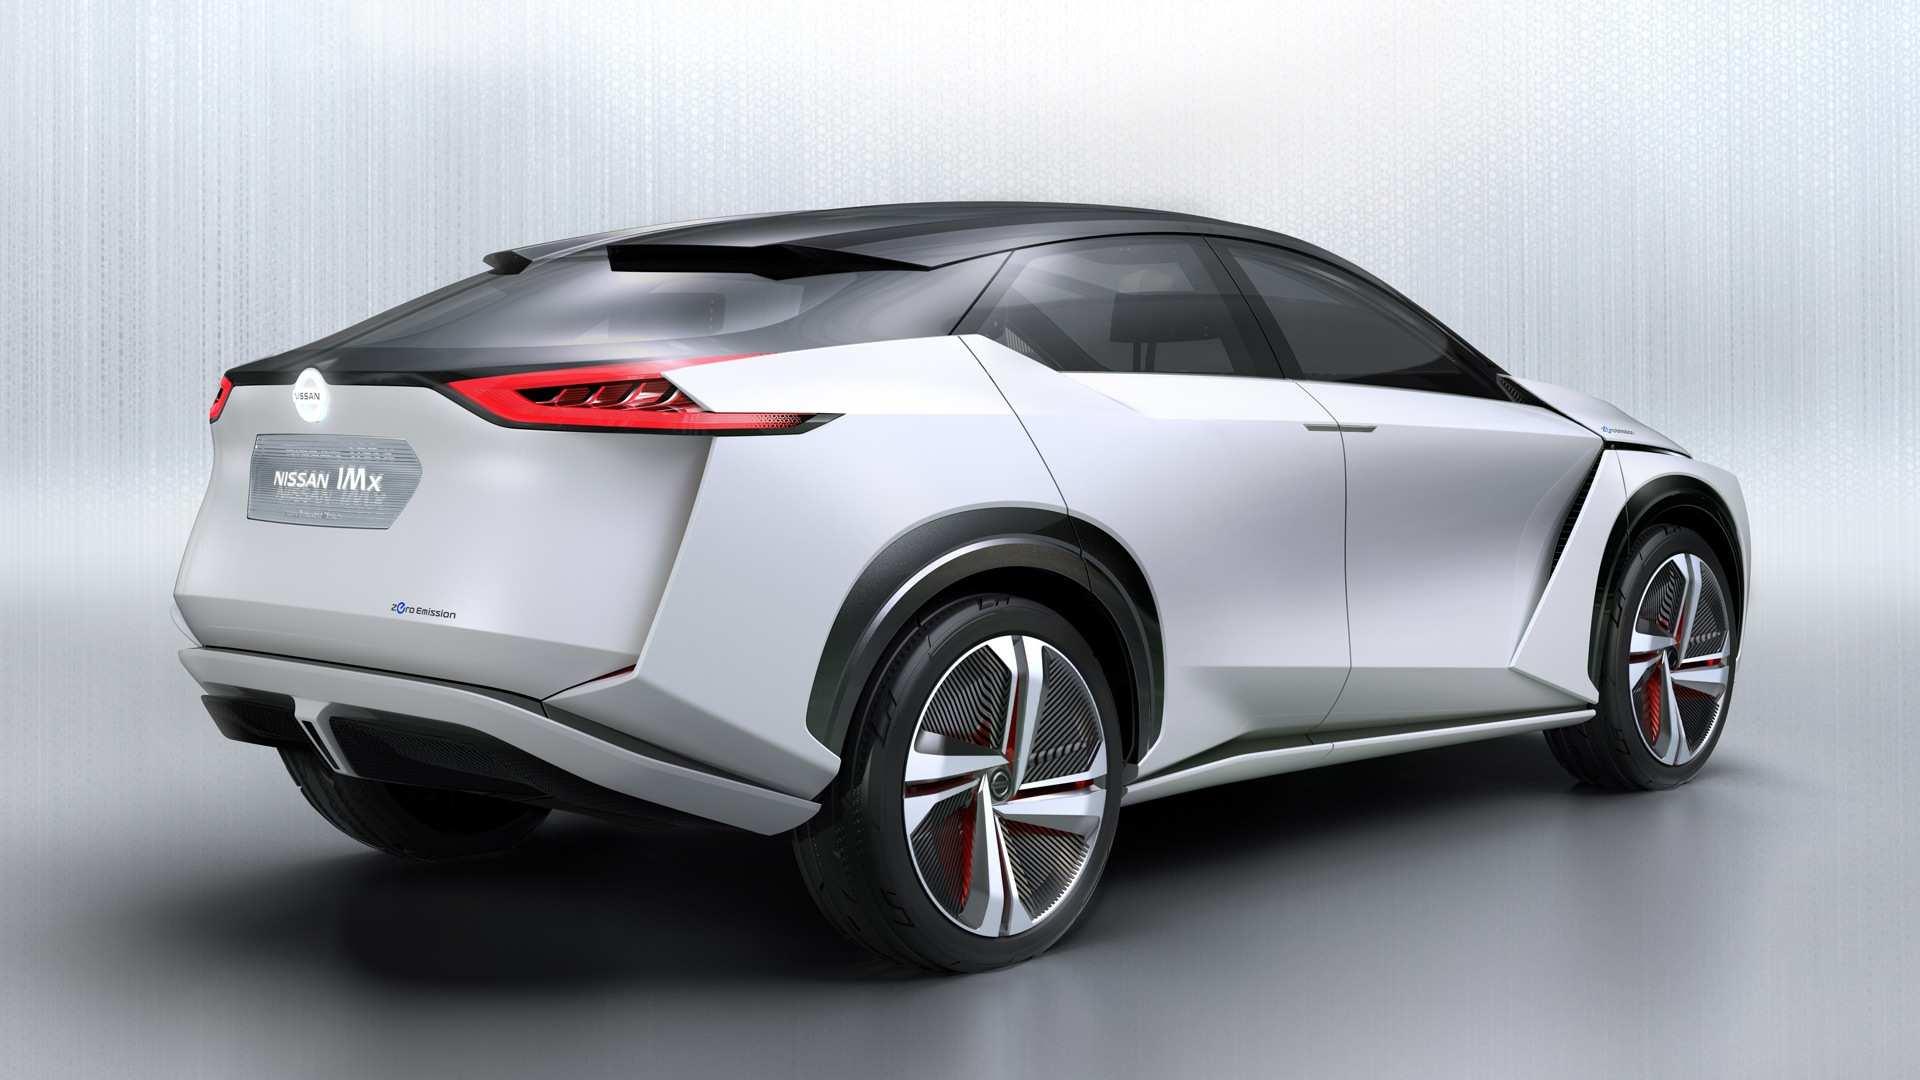 73 New Nissan Leaf Suv 2020 Images by Nissan Leaf Suv 2020